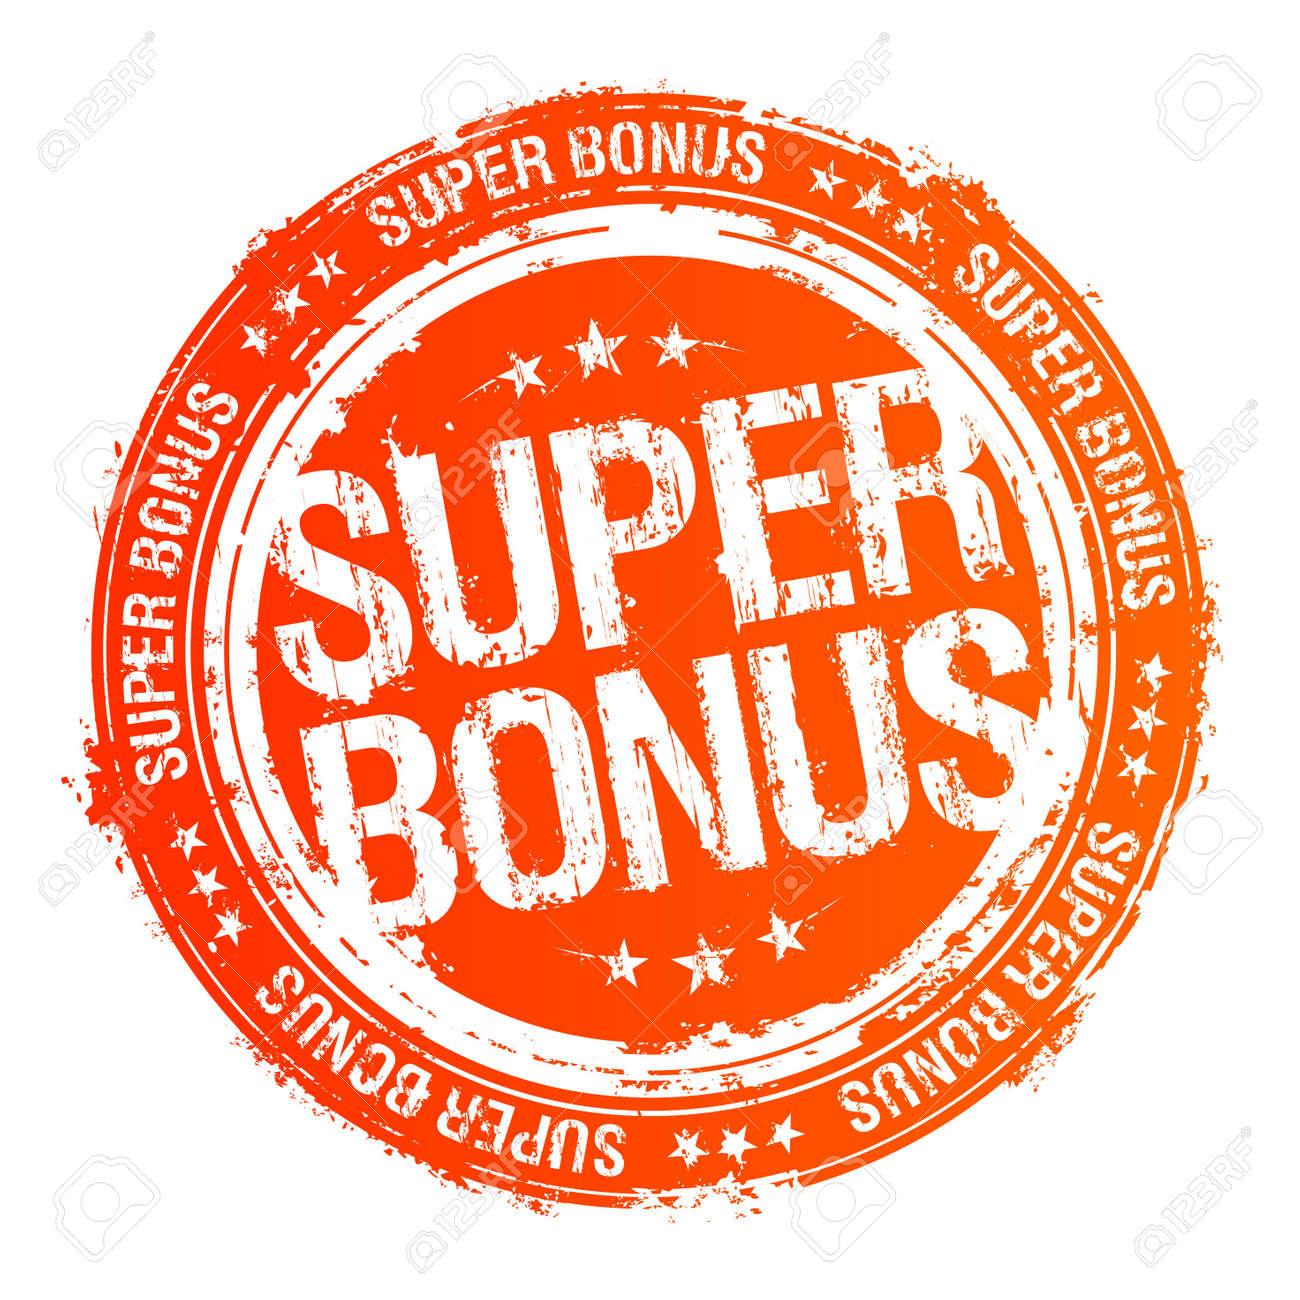 Super bonus vector rubber stamp. Stock Vector - 10283284